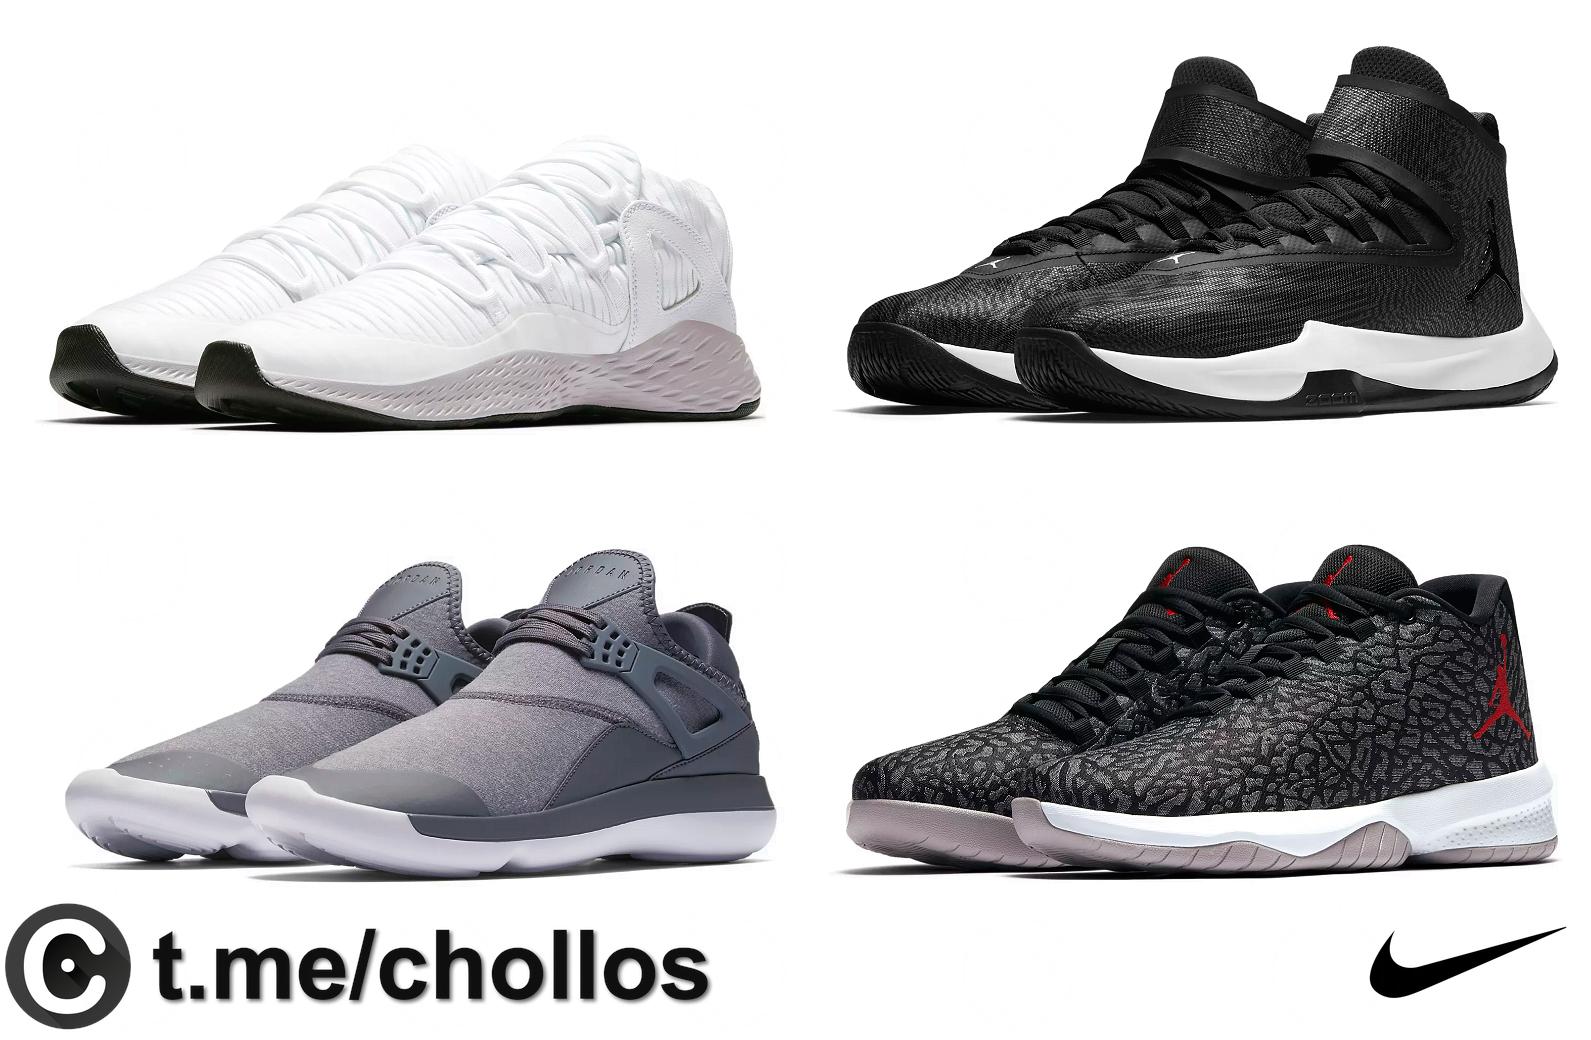 Modelos de NIKE Jordan desde 44€